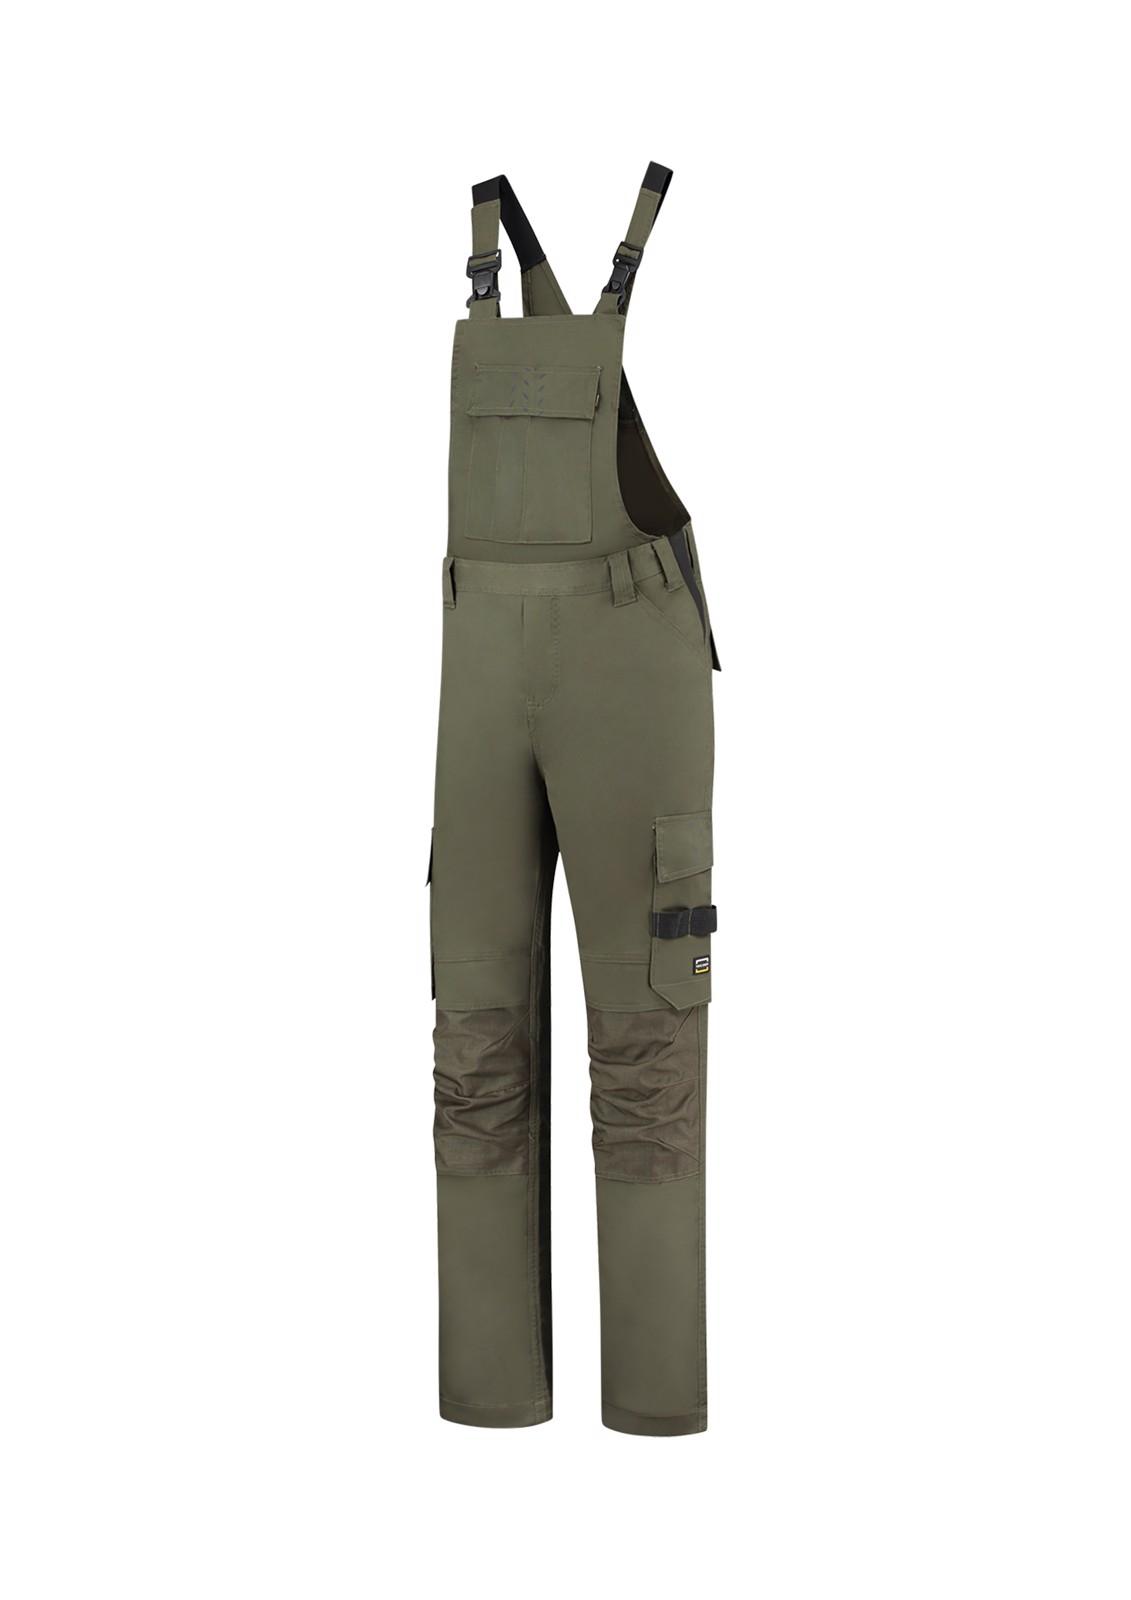 Pracovní kalhoty s laclem unisex Tricorp Bib & Brace Twill Cordura - Army / 60